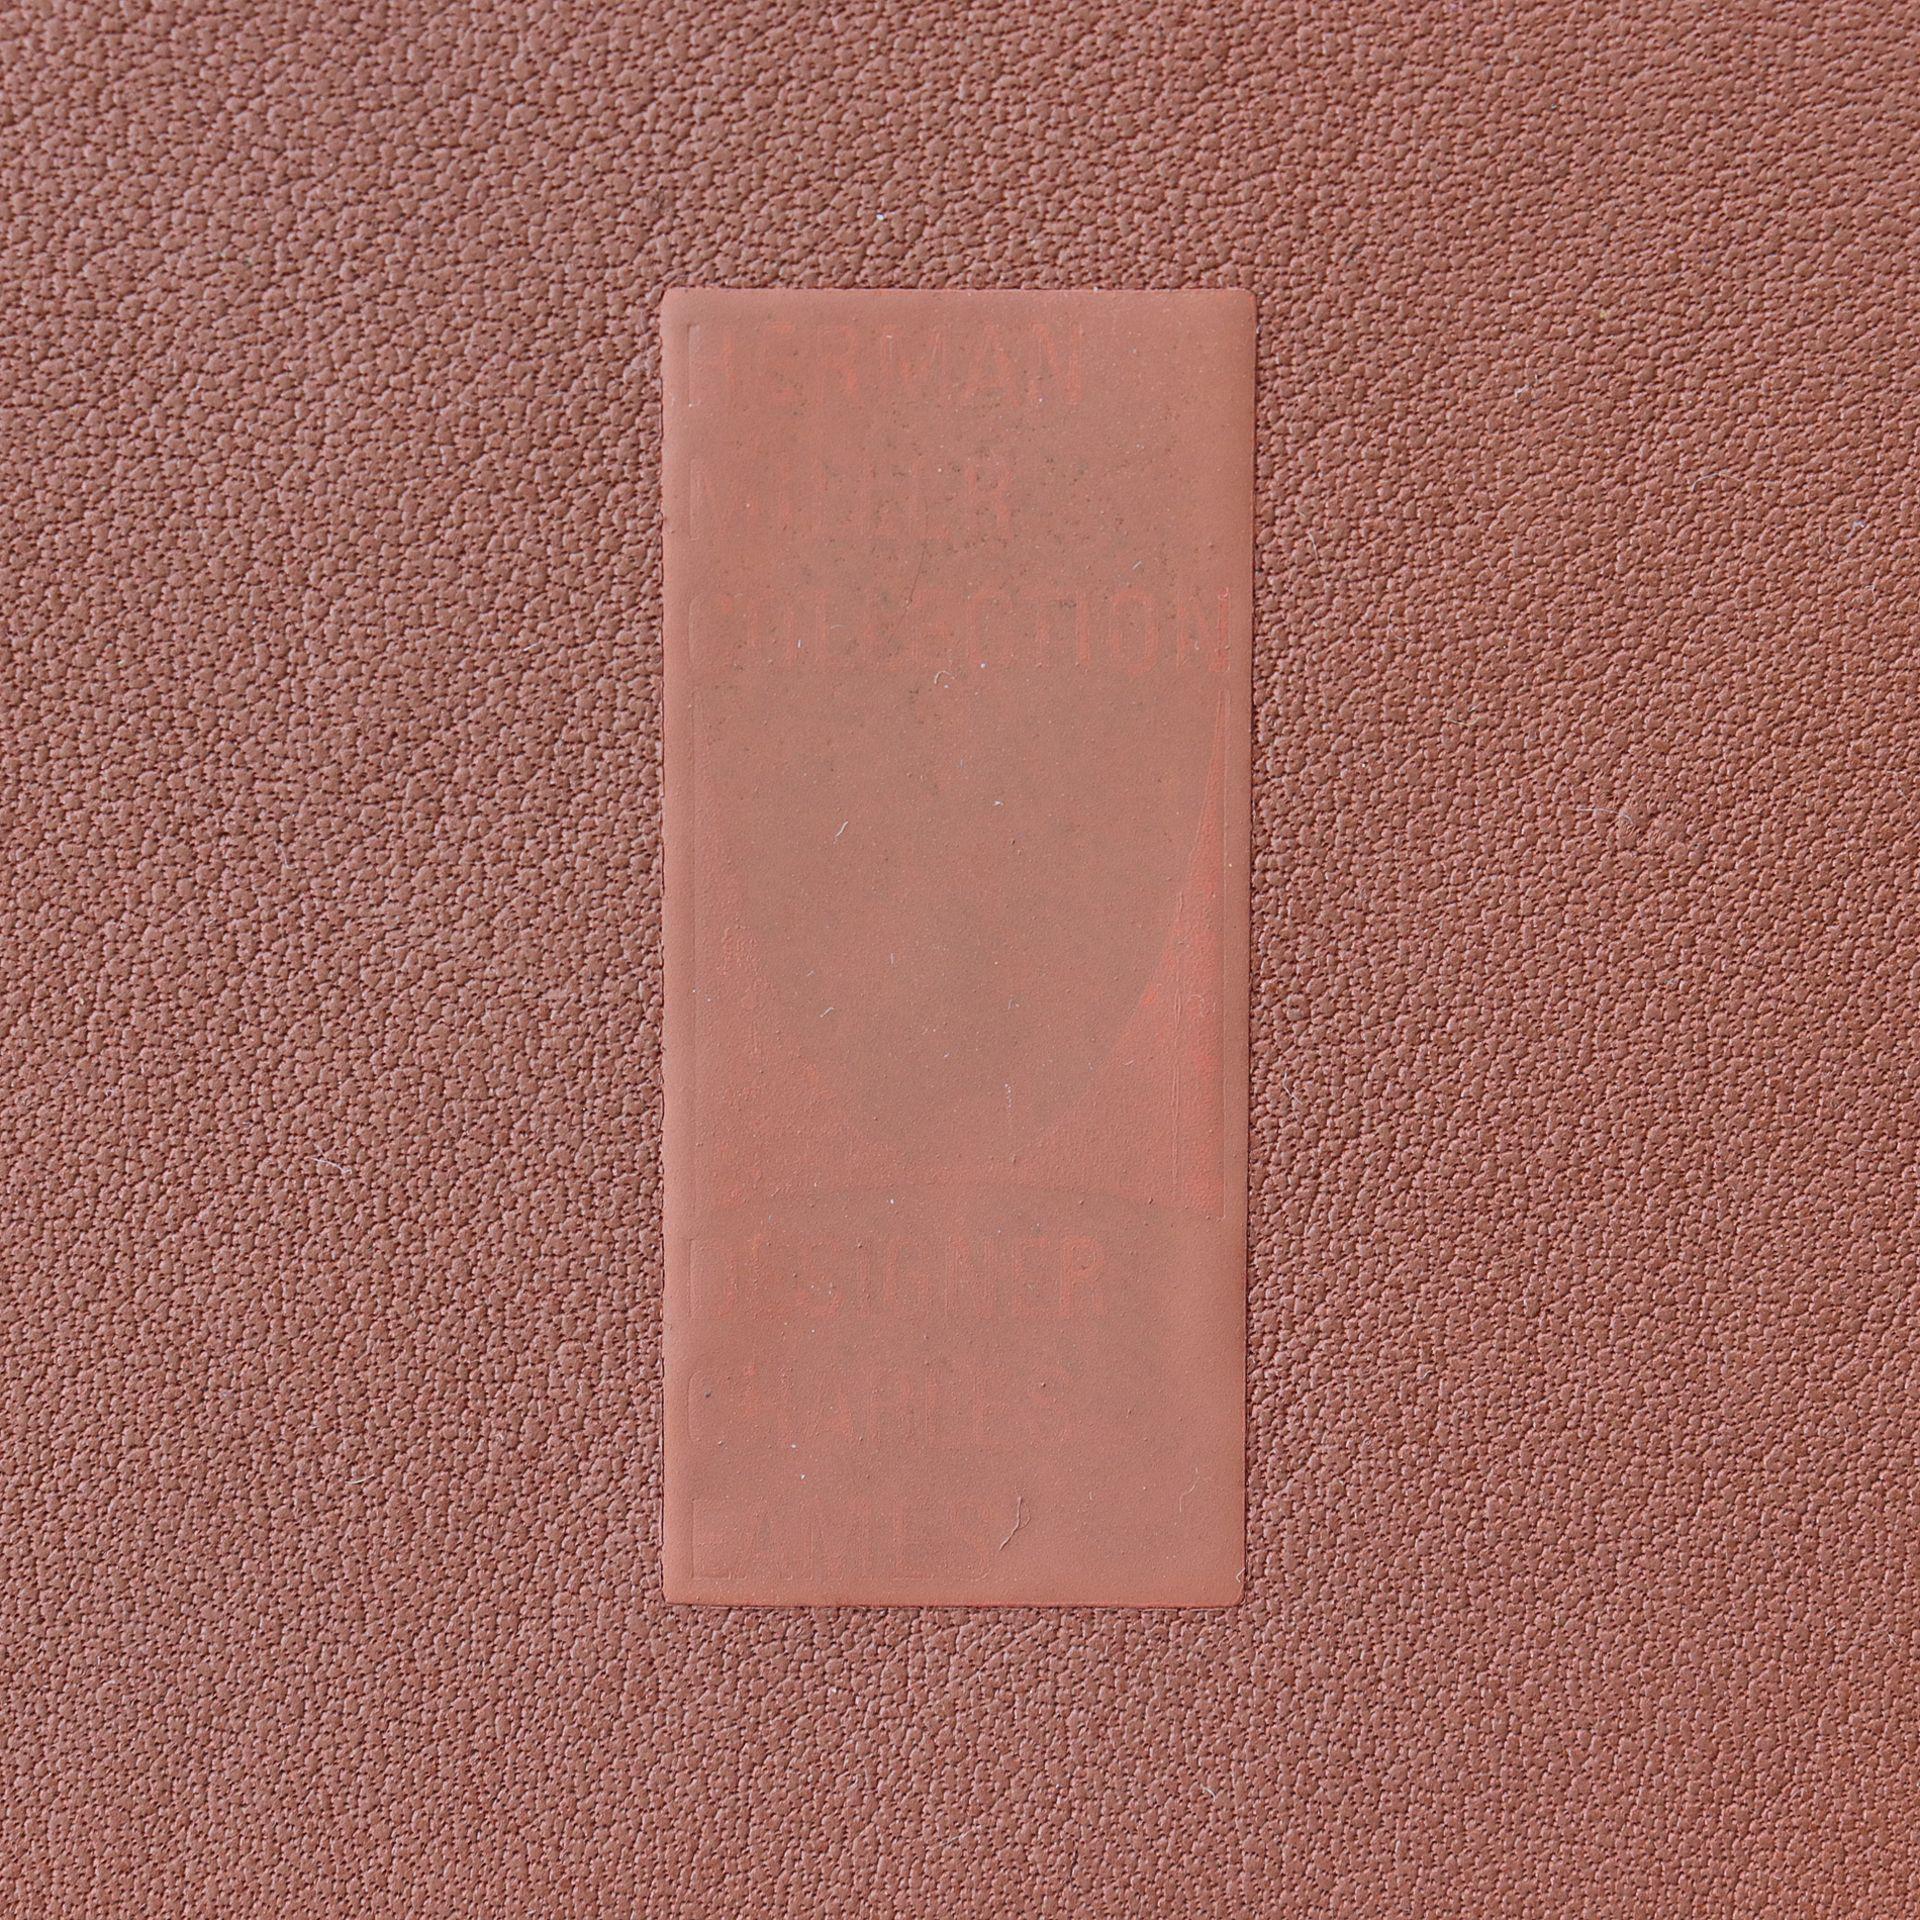 Eames-Schalensessel - 8er Satz - Image 5 of 9